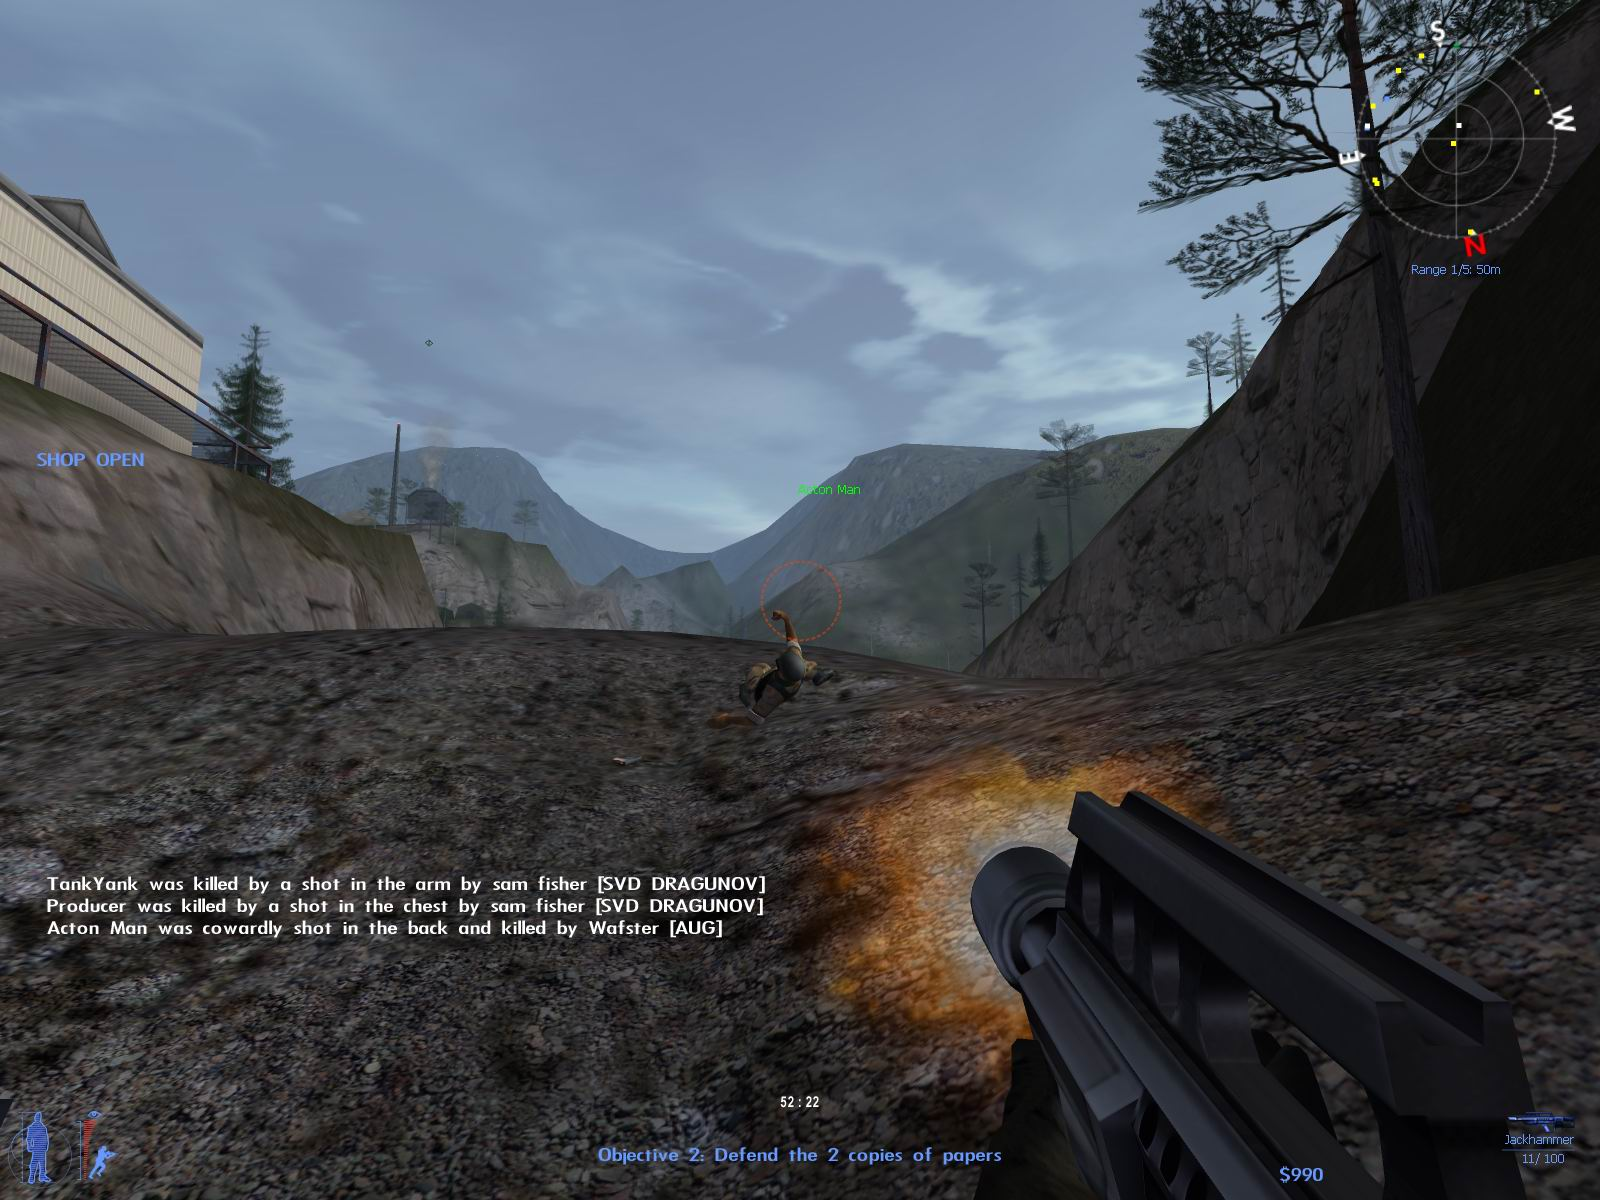 Description: Shots showing off multiplayer action in IGI 2: Covert Strike, Innerloop's upcoming shooter sequel